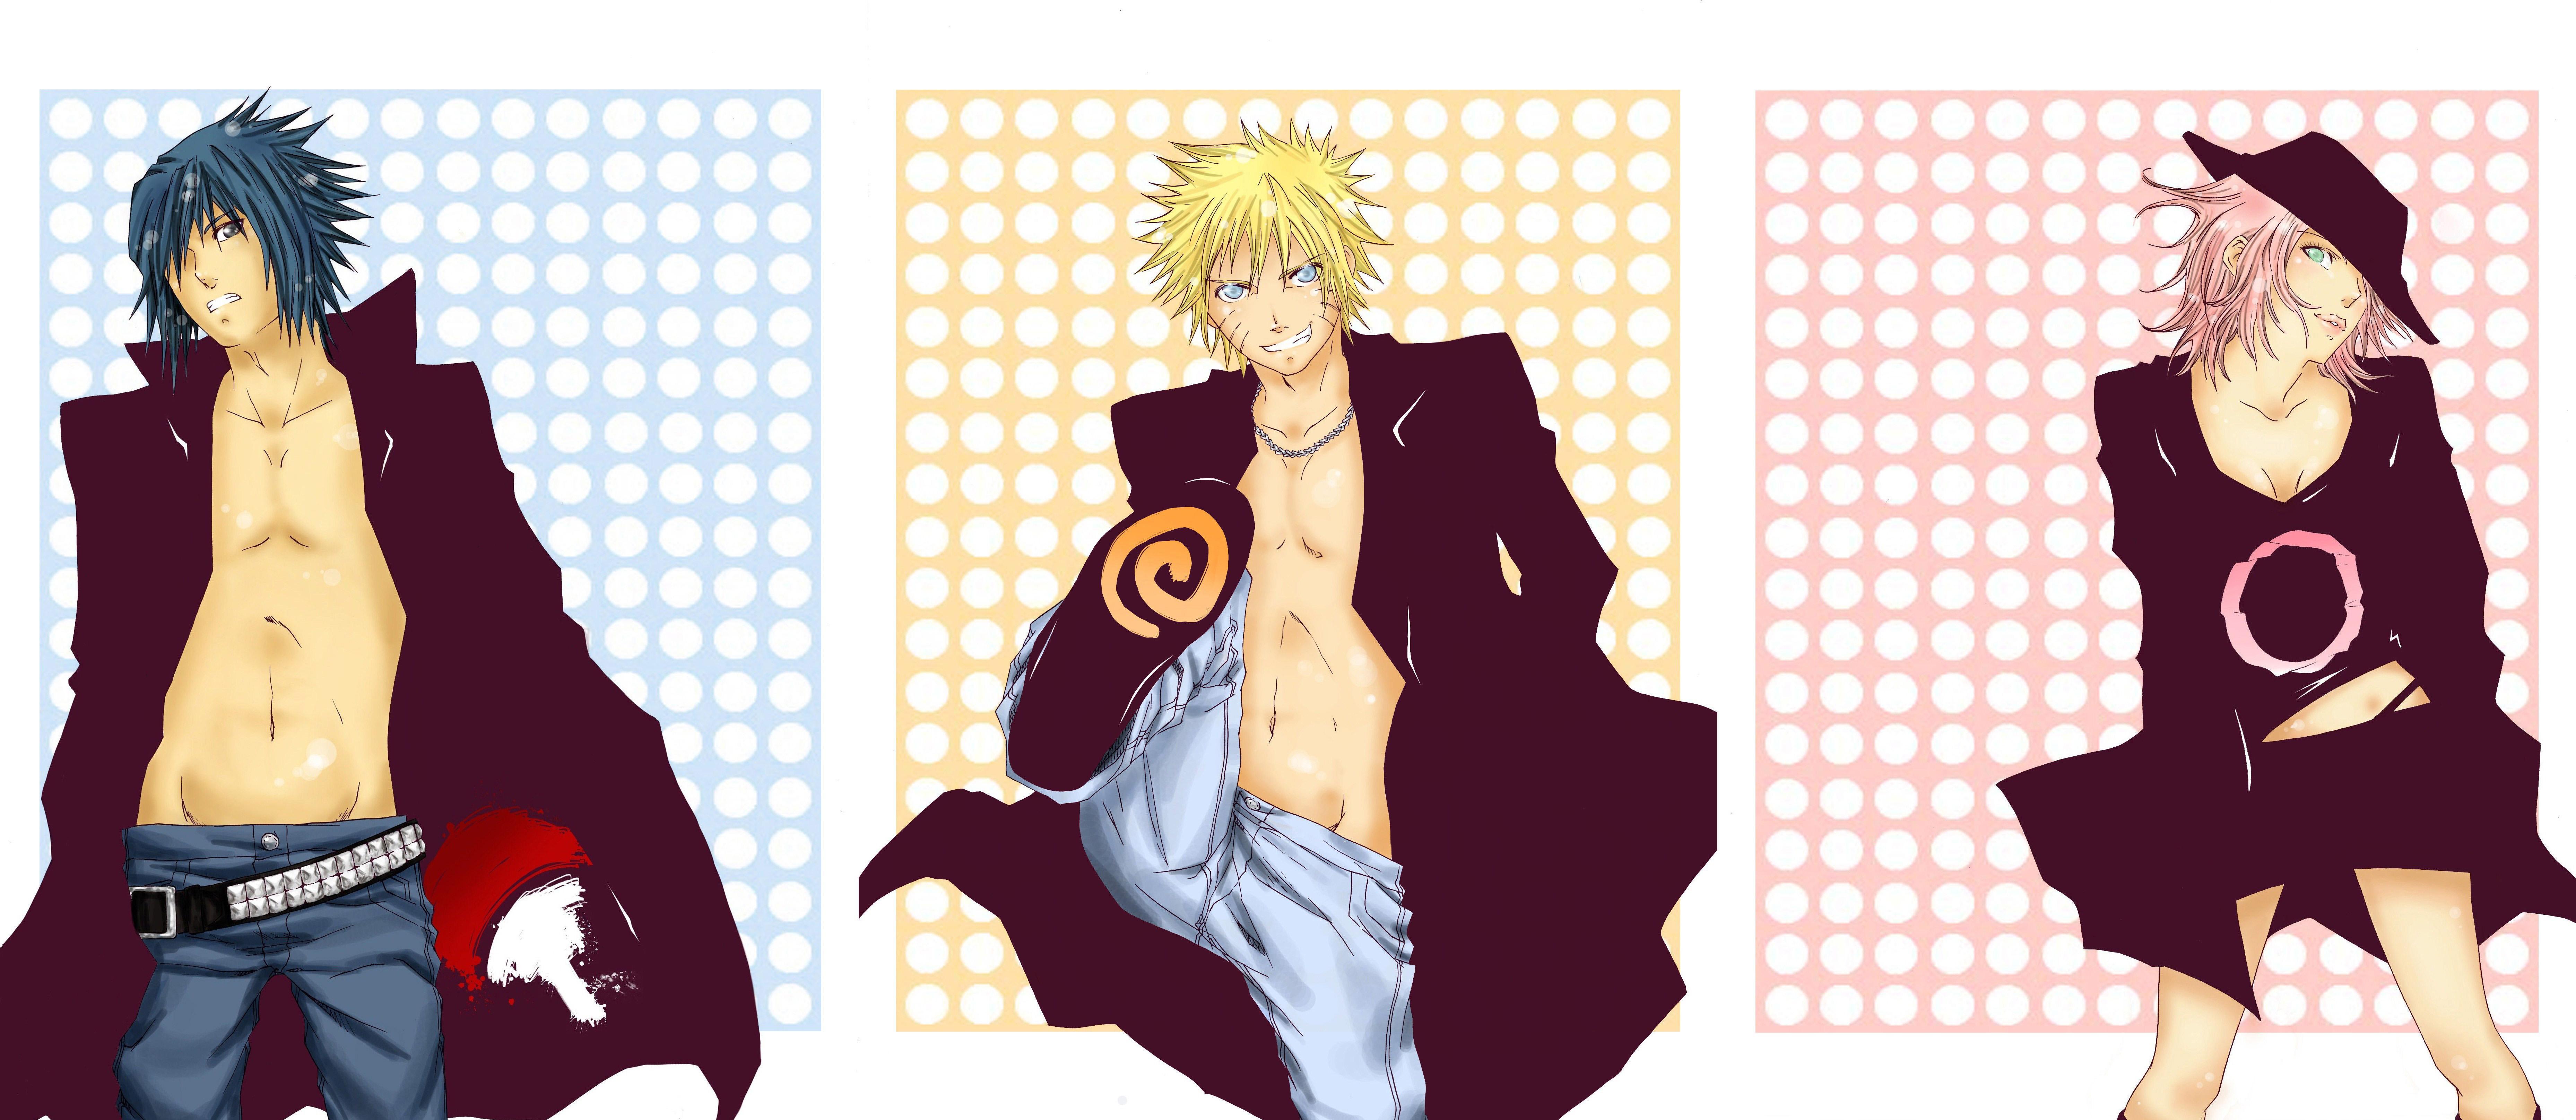 Sasuke Naruto Sakura Wallpaper   ForWallpapercom 7431x3231